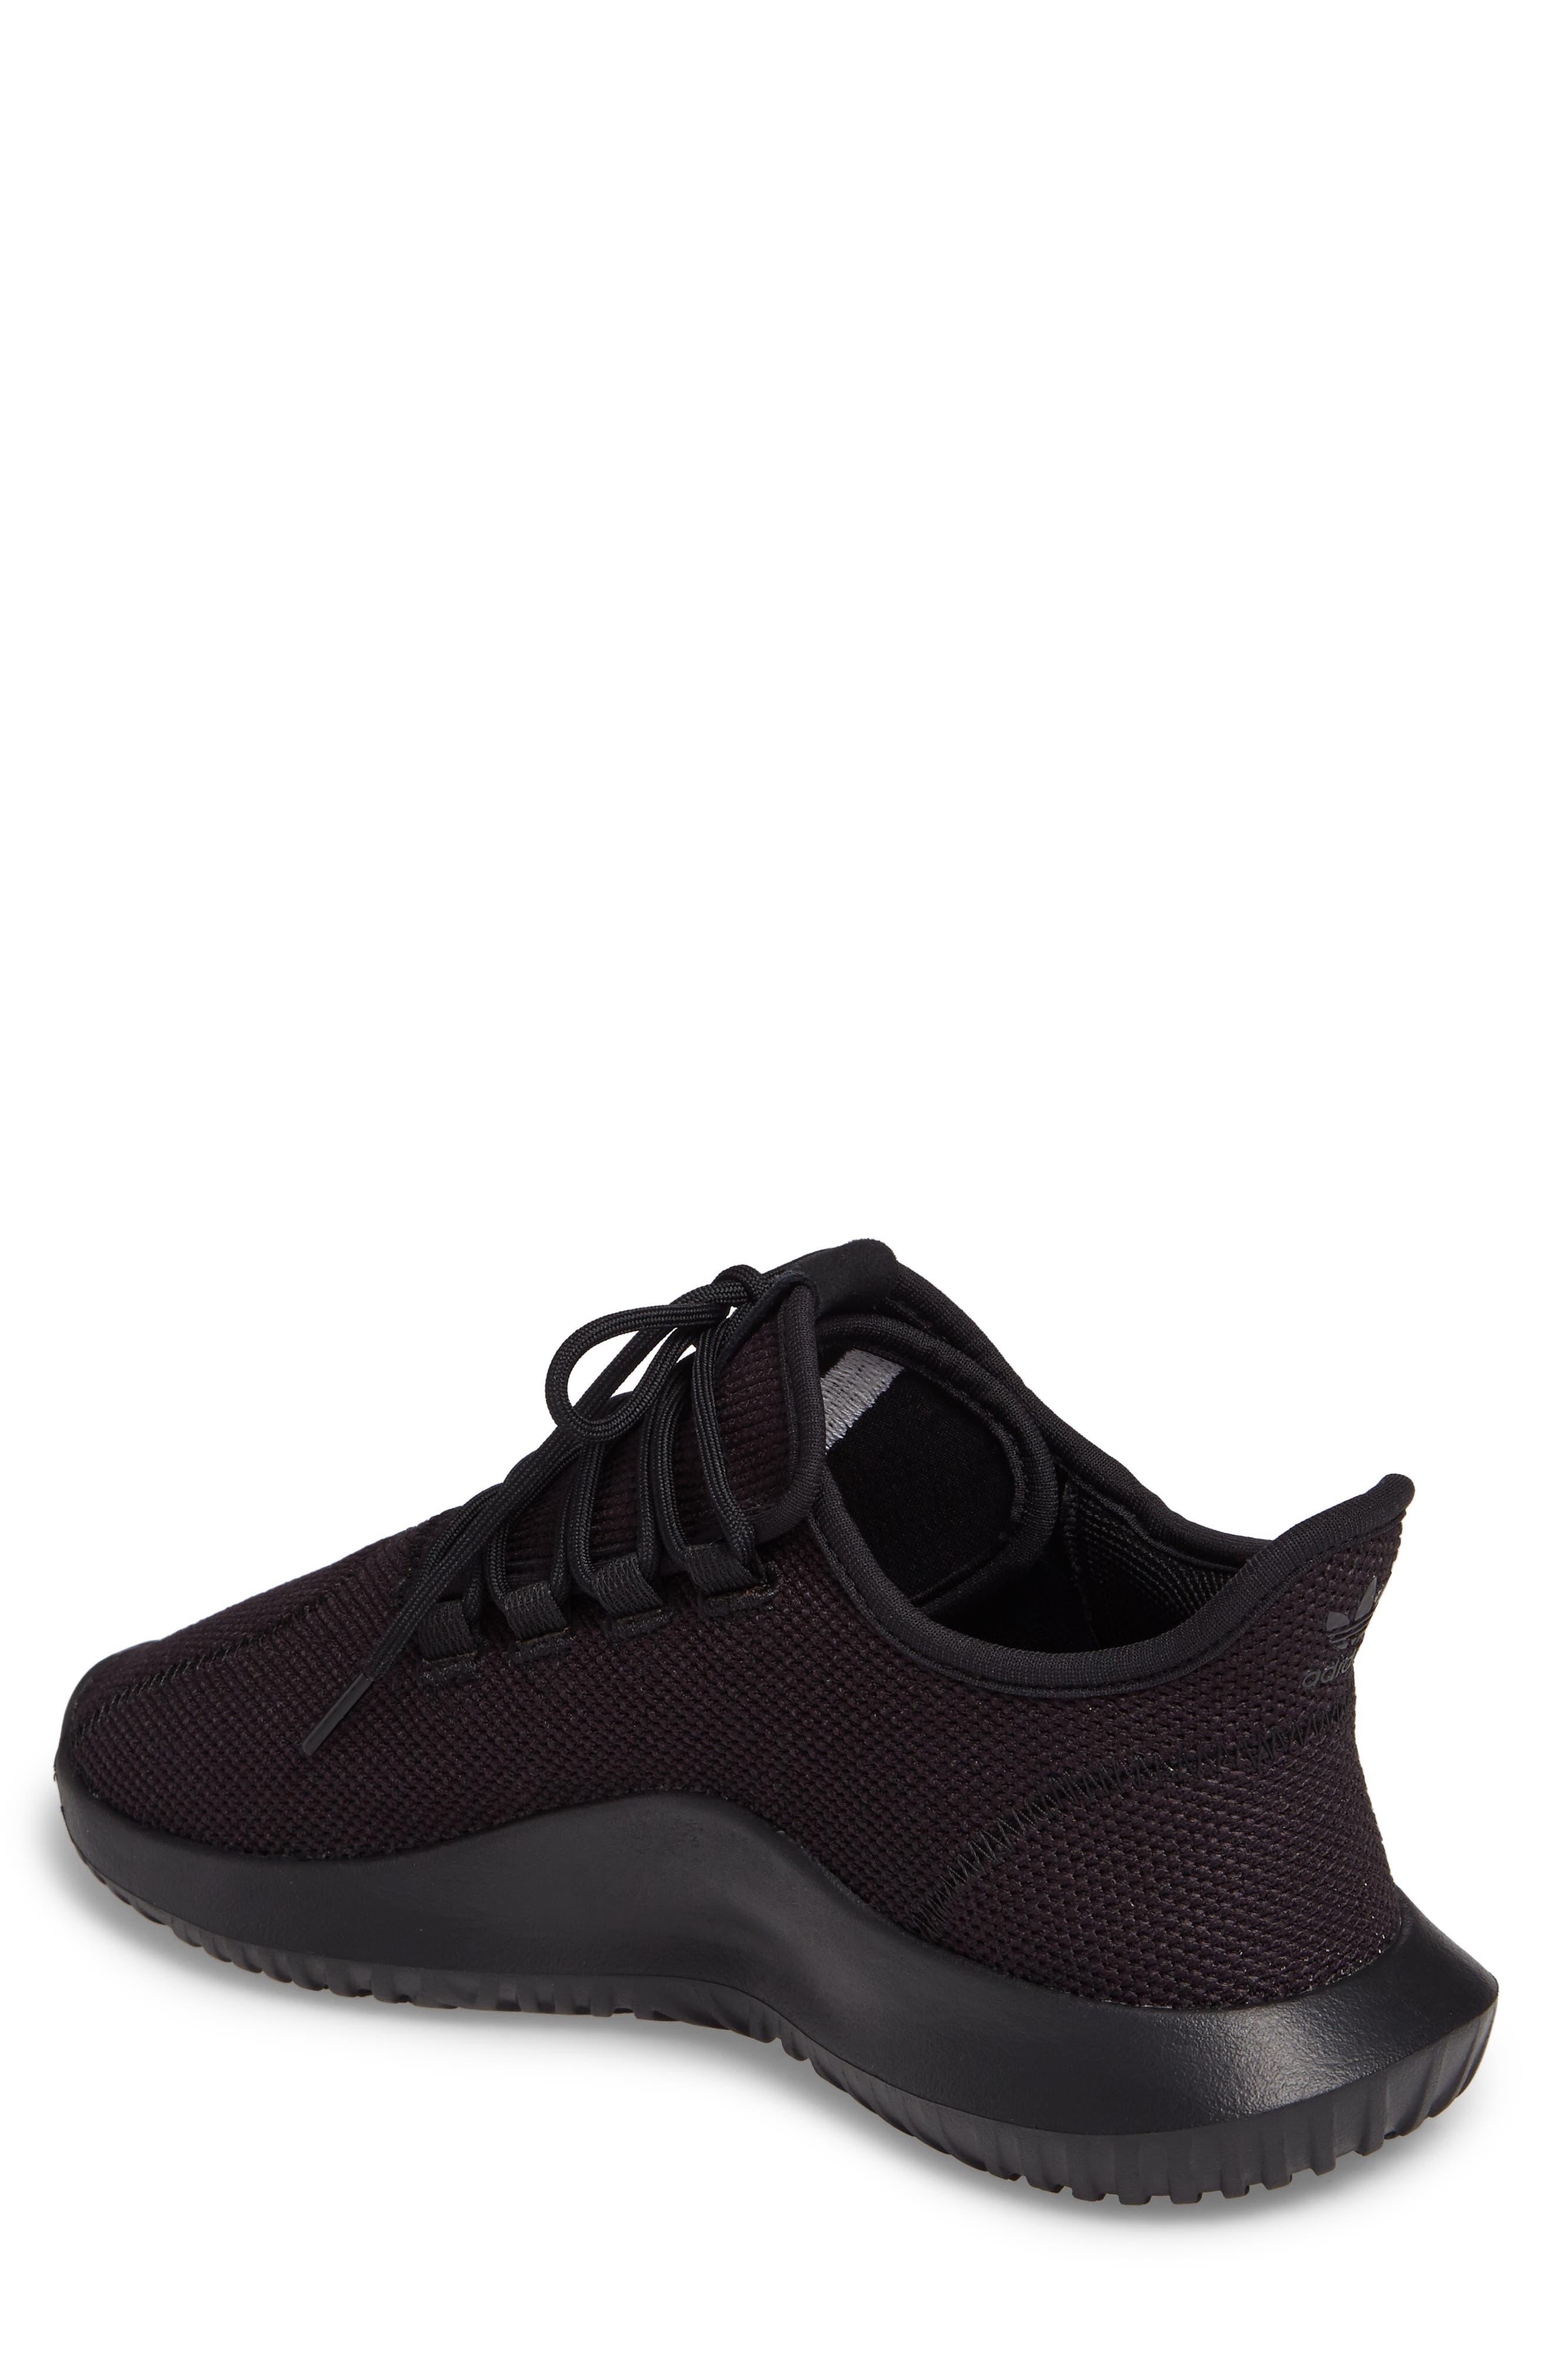 Tubular Shadow Sneaker,                             Alternate thumbnail 2, color,                             Core Black/ White/ Core Black